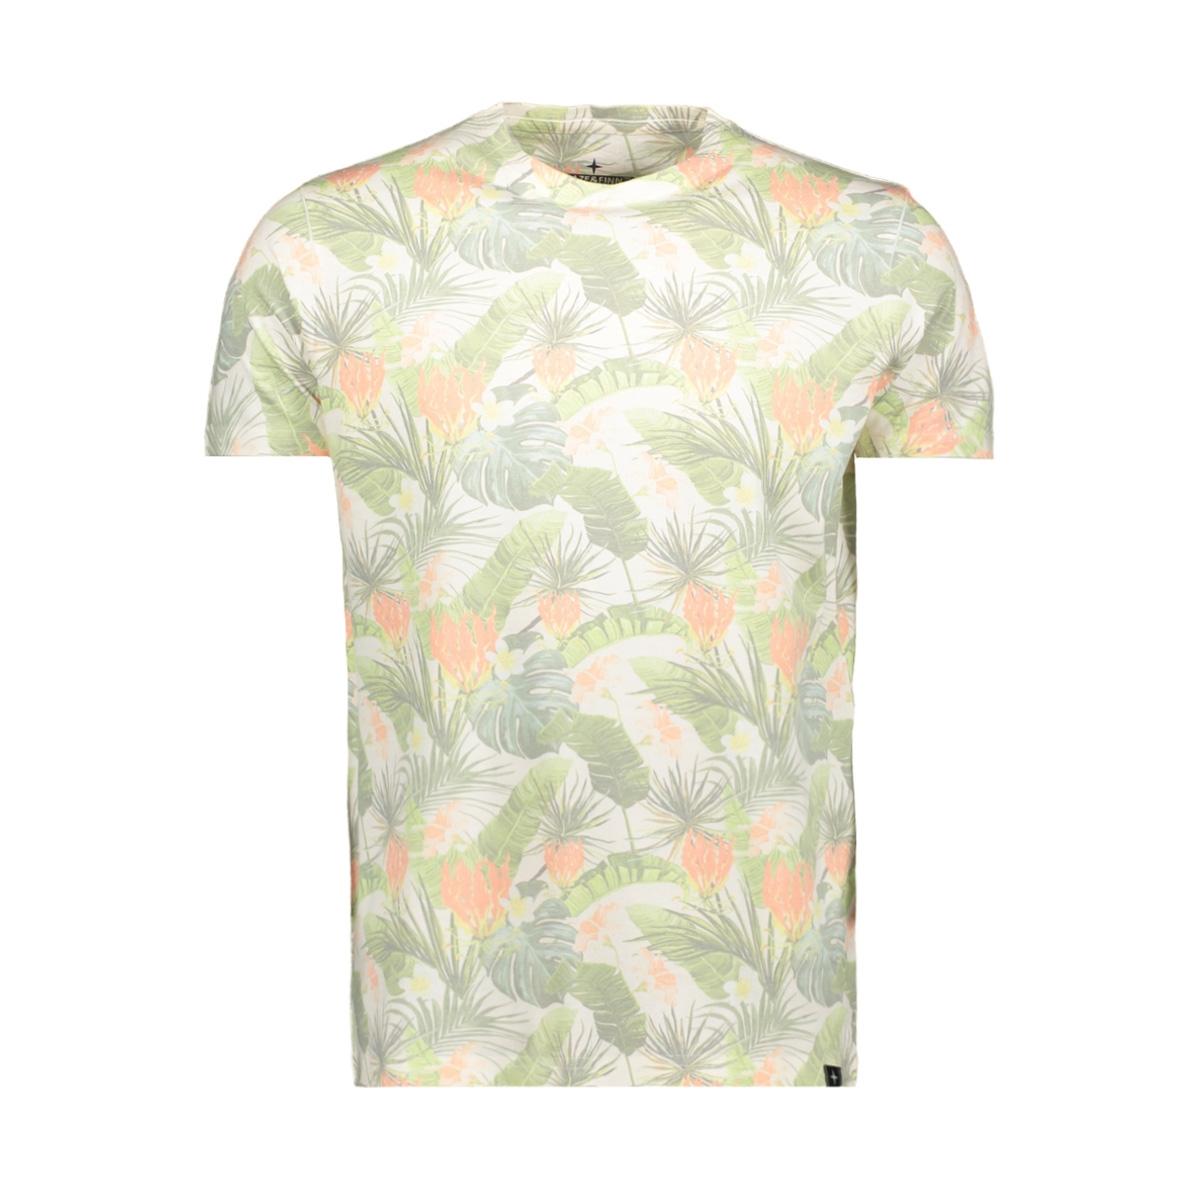 tee sublimation print mu11 0002 haze & finn t-shirt white jungle